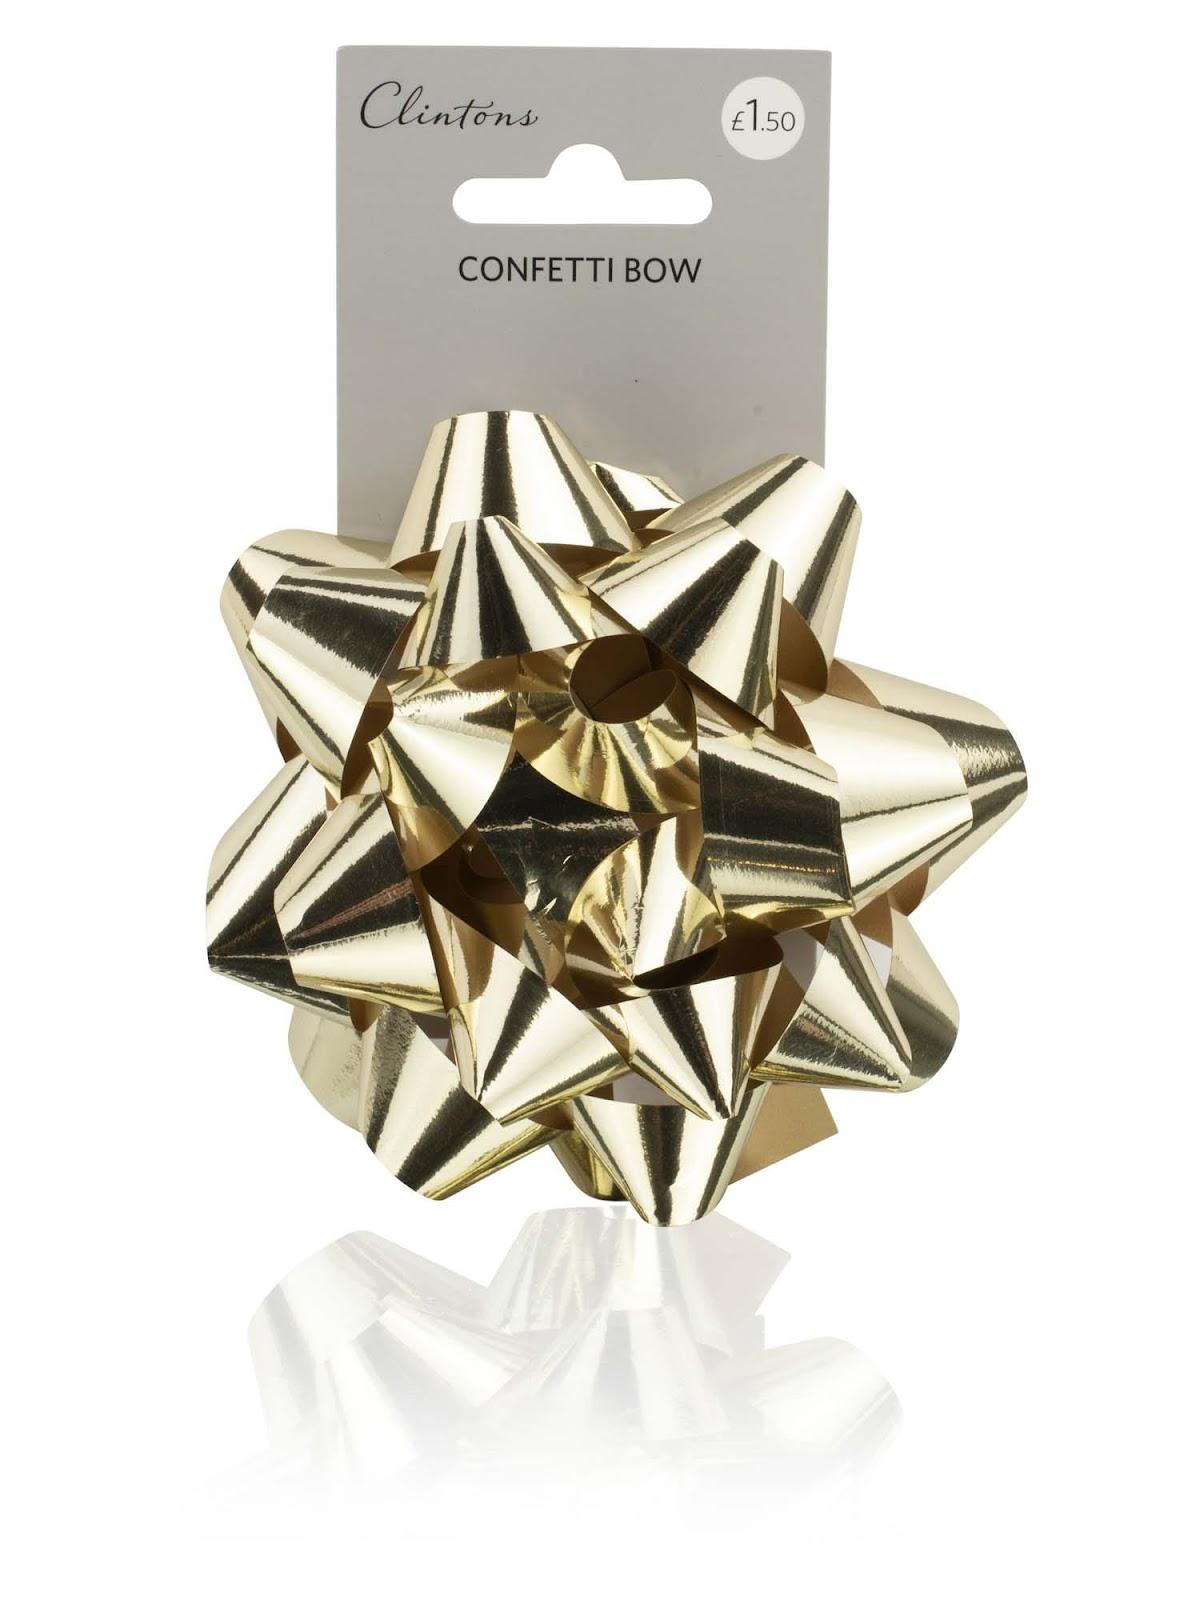 Clintons Metallic Gold Confetti Gift Bow